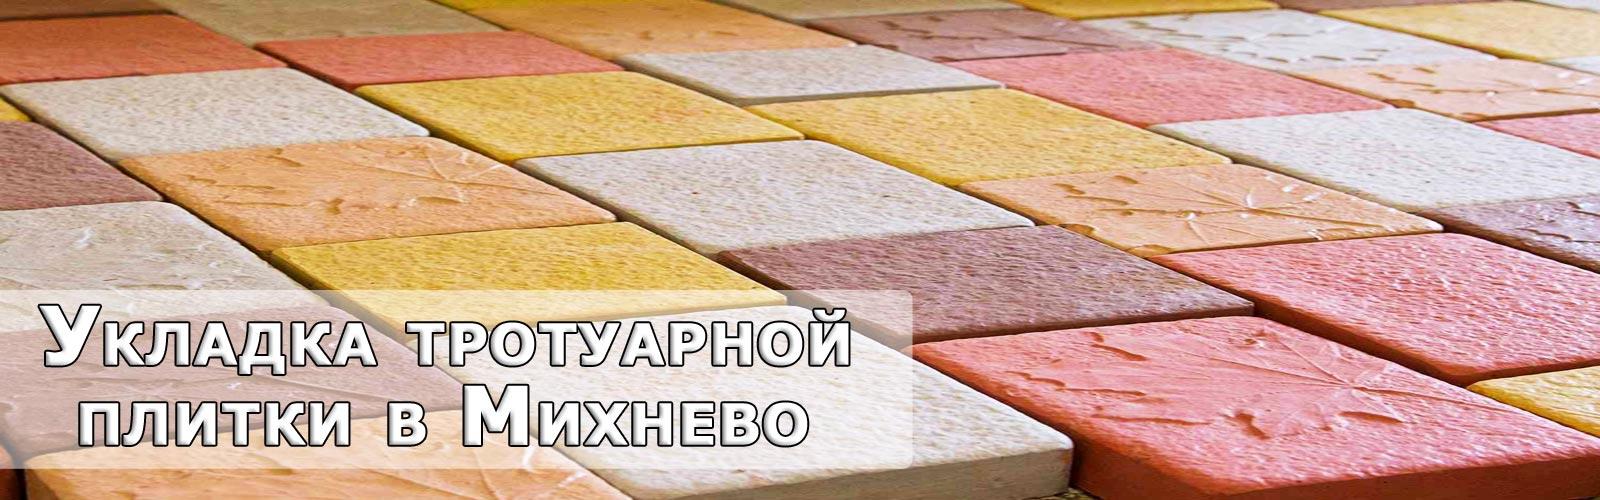 Тротуарная плитка Михнево